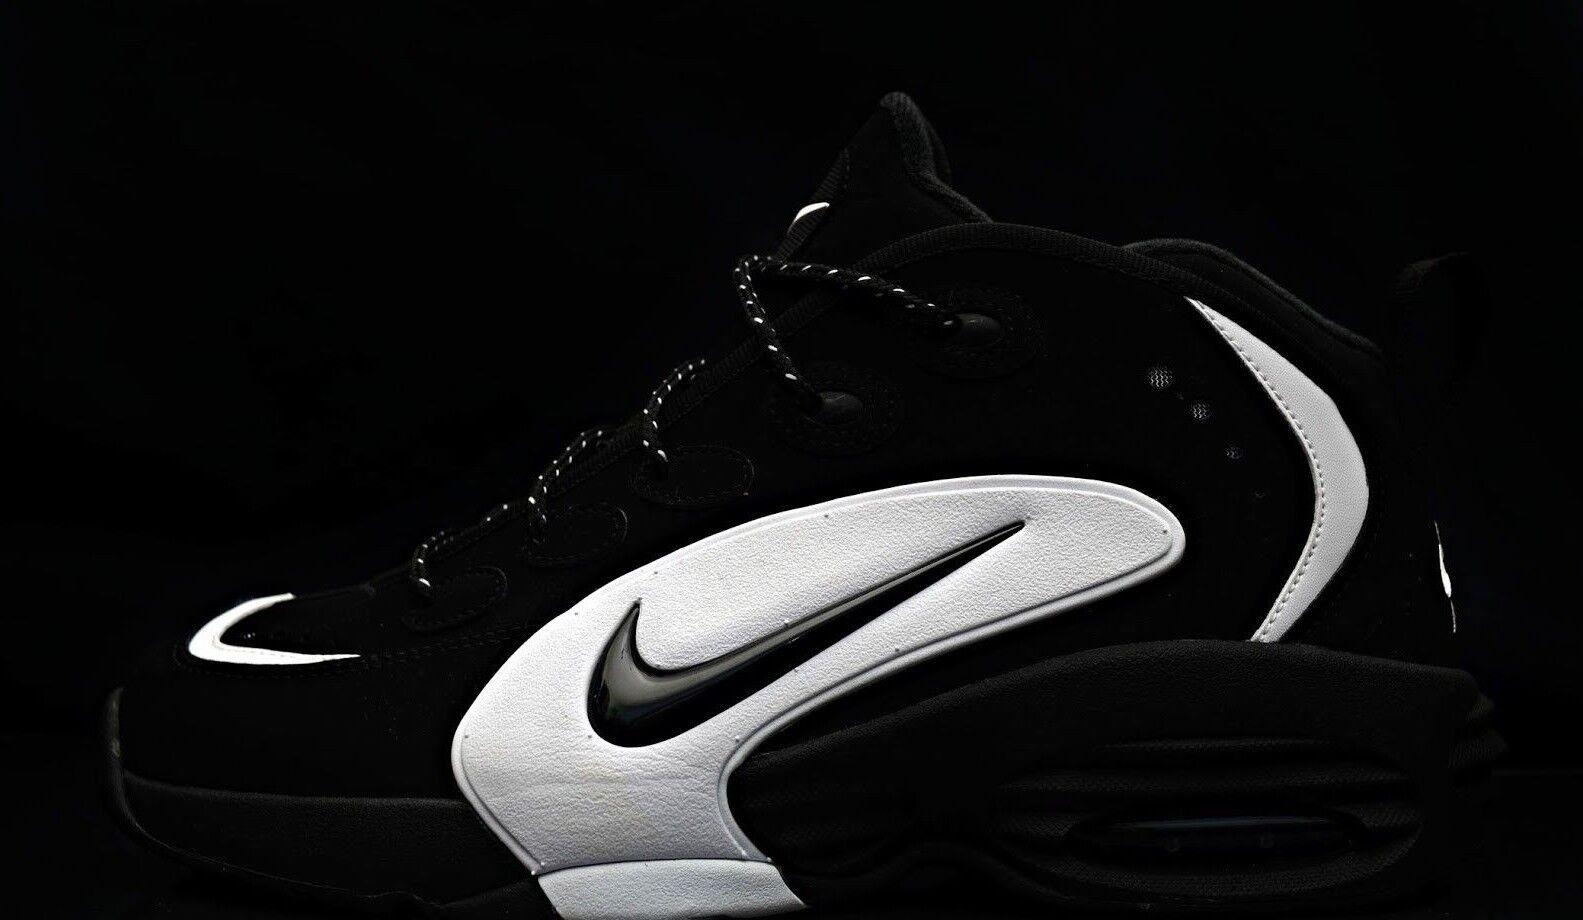 Nike air WAY UP OG  sz 11.5 black max 1 95 97 96 93 98 120 270 180 force dunk sb